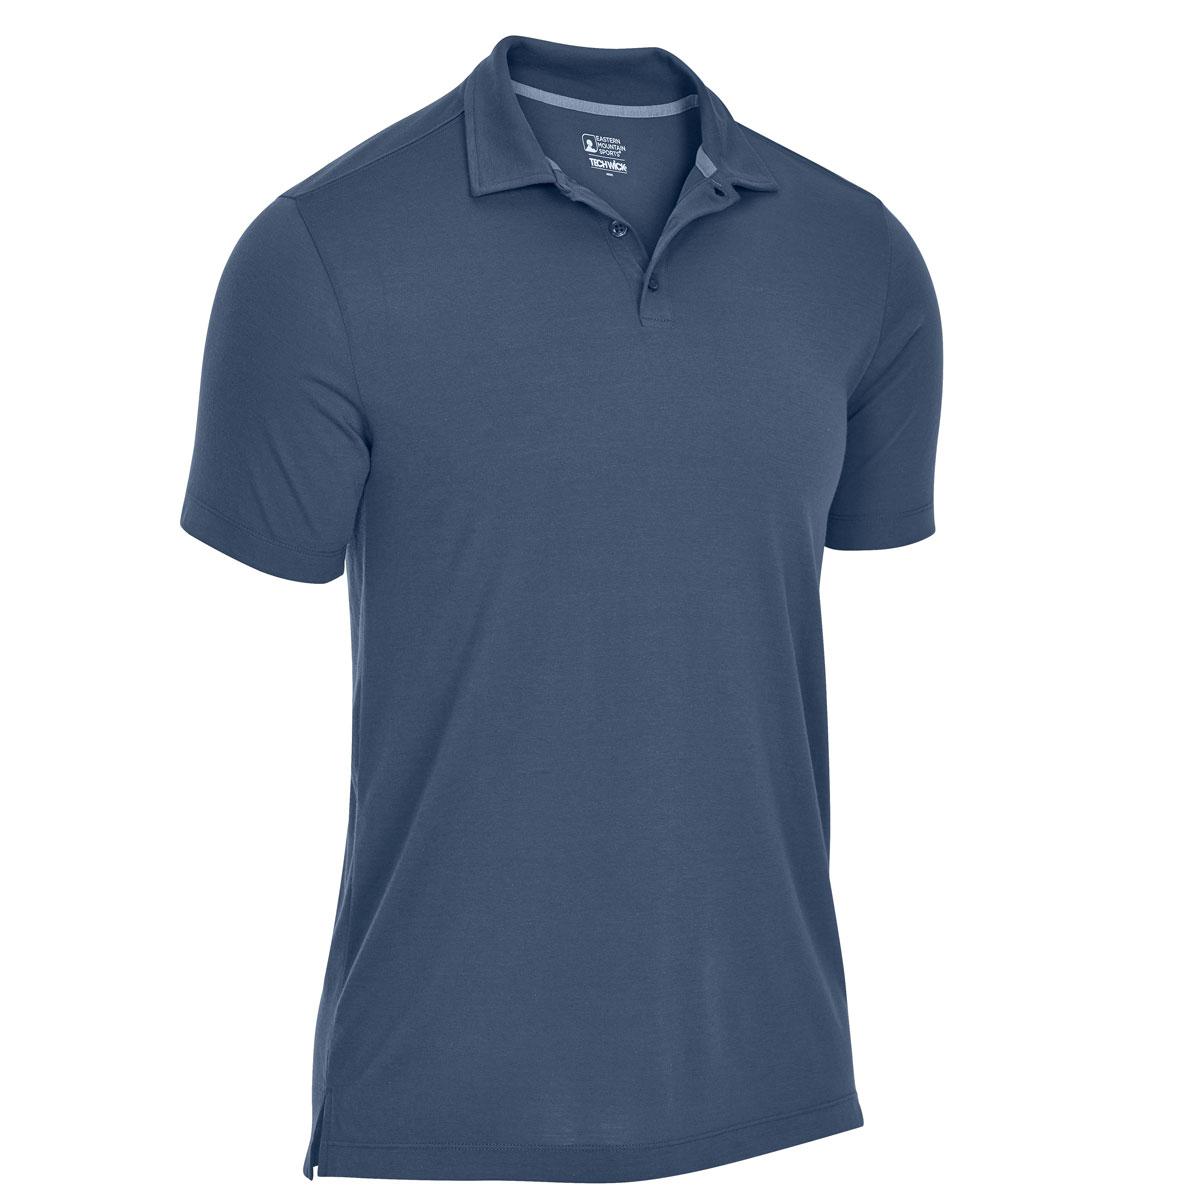 Ems Men's Techwick Vital Polo - Blue, M